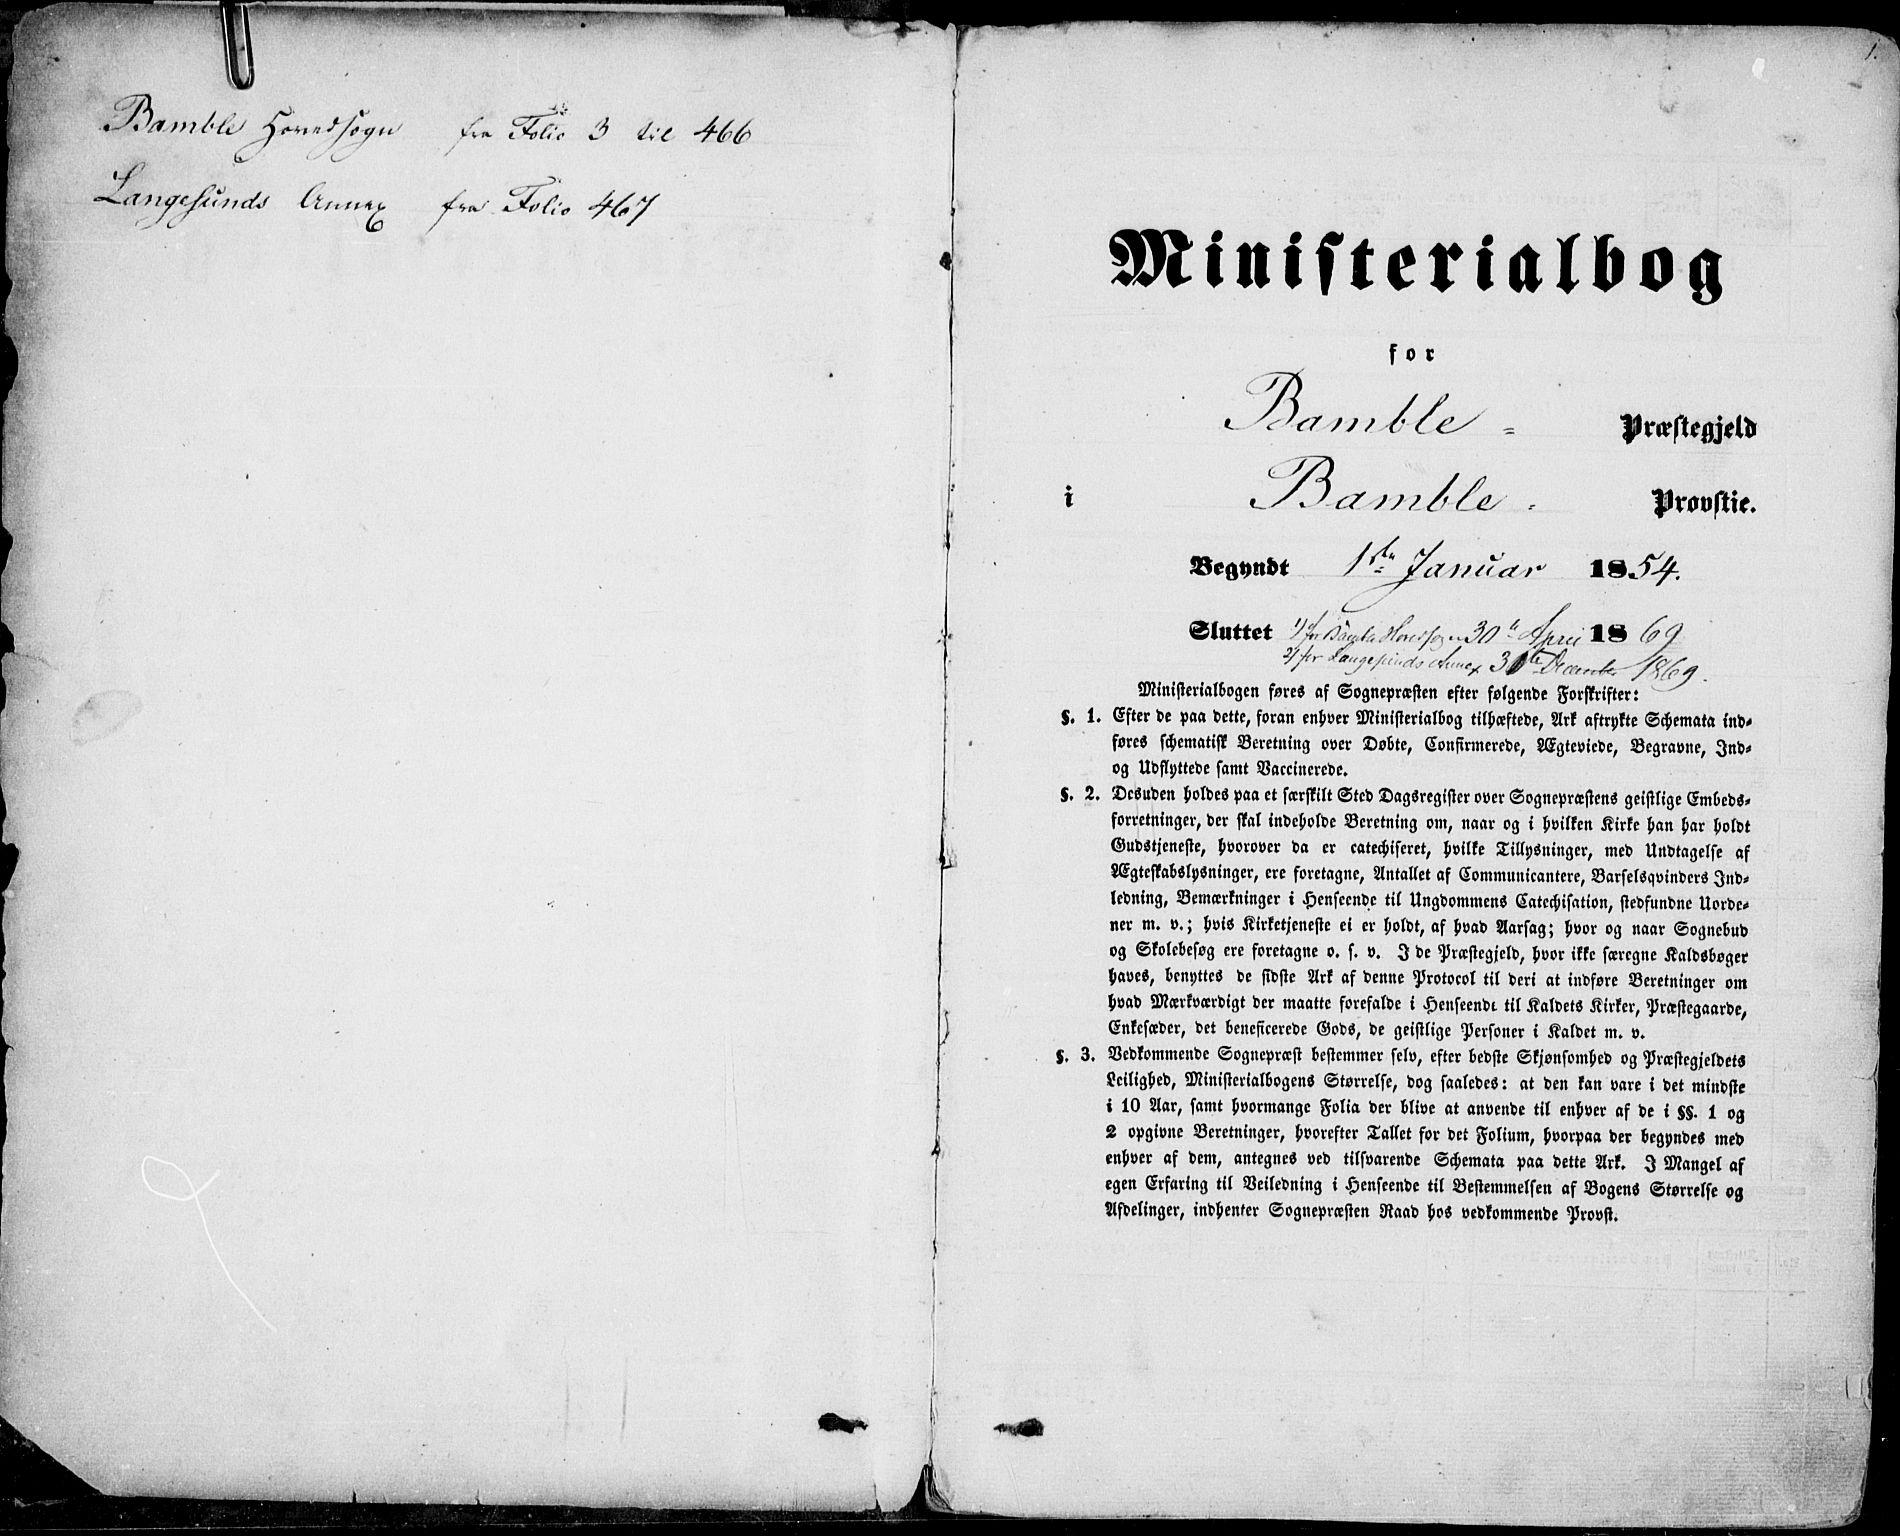 SAKO, Bamble kirkebøker, F/Fa/L0005: Ministerialbok nr. I 5, 1854-1869, s. 1